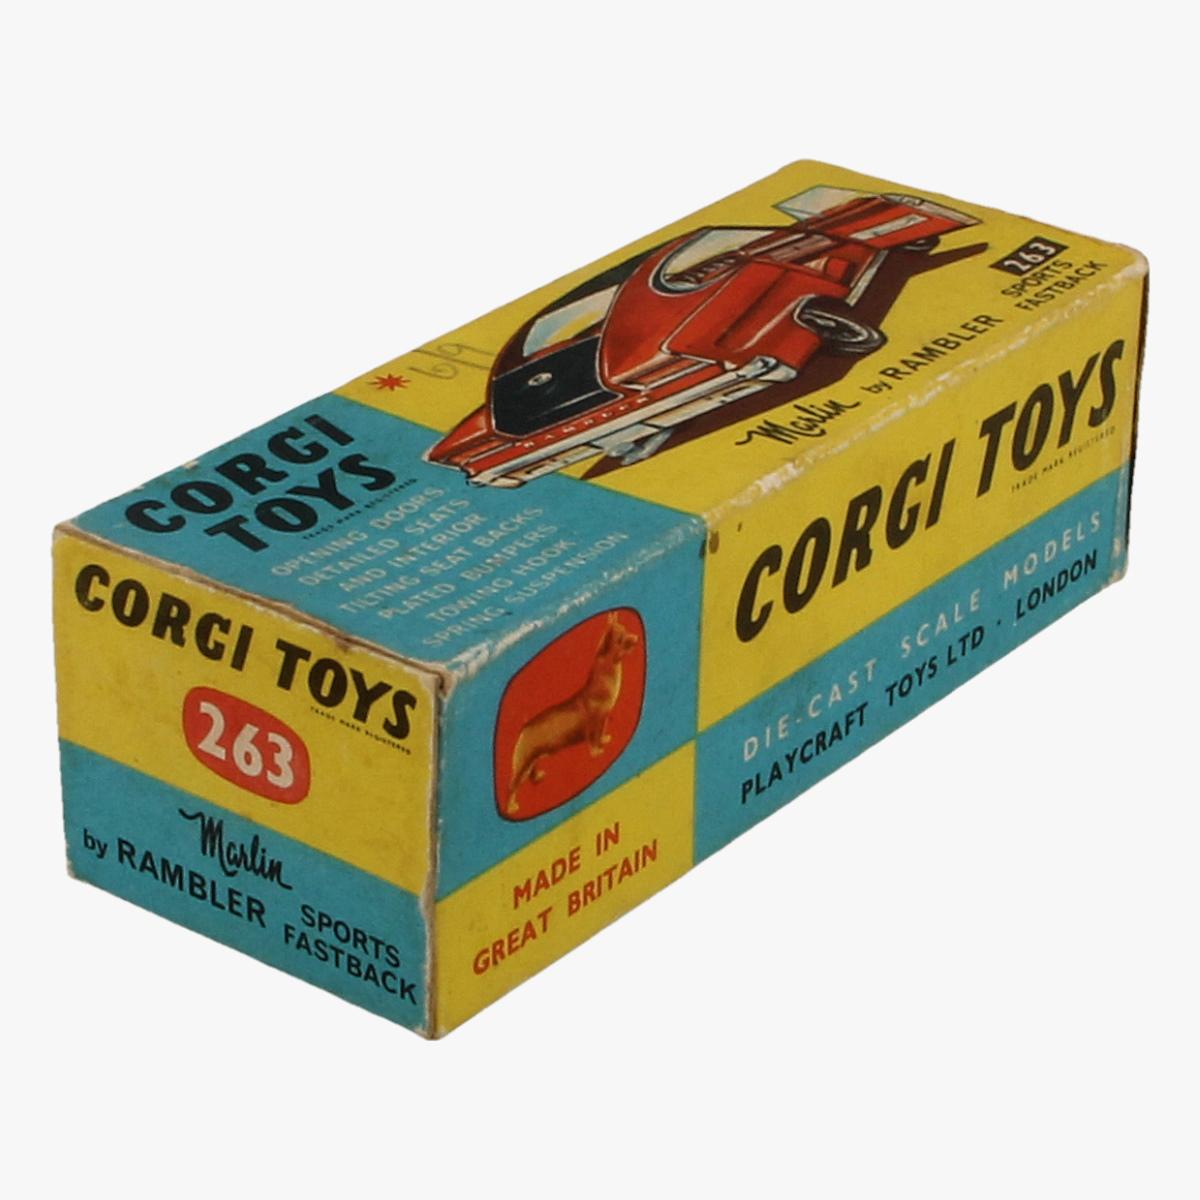 Afbeeldingen van Corgi Toys. Marlin By Rambler, Sports Fastback. Nr. 263